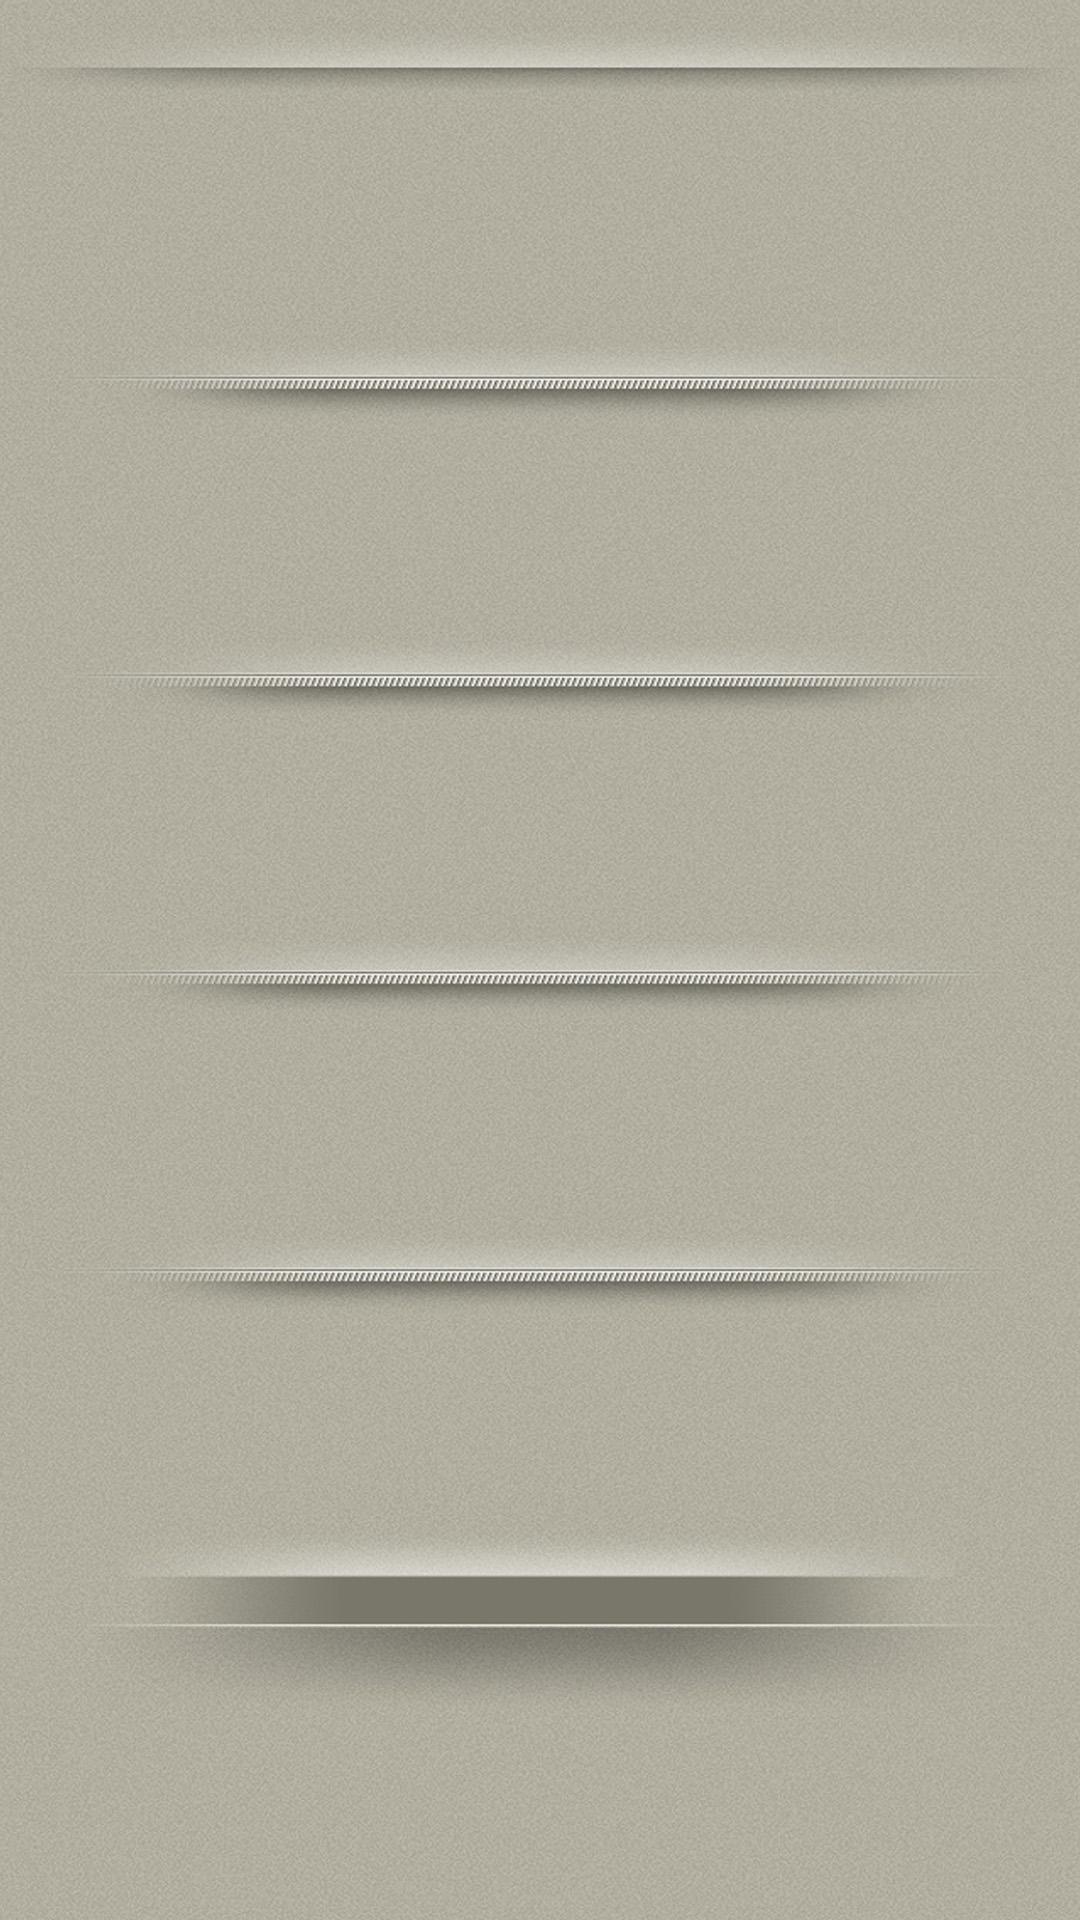 home shelf shelf iphone 6 plus wallpaper 73 1080x1920